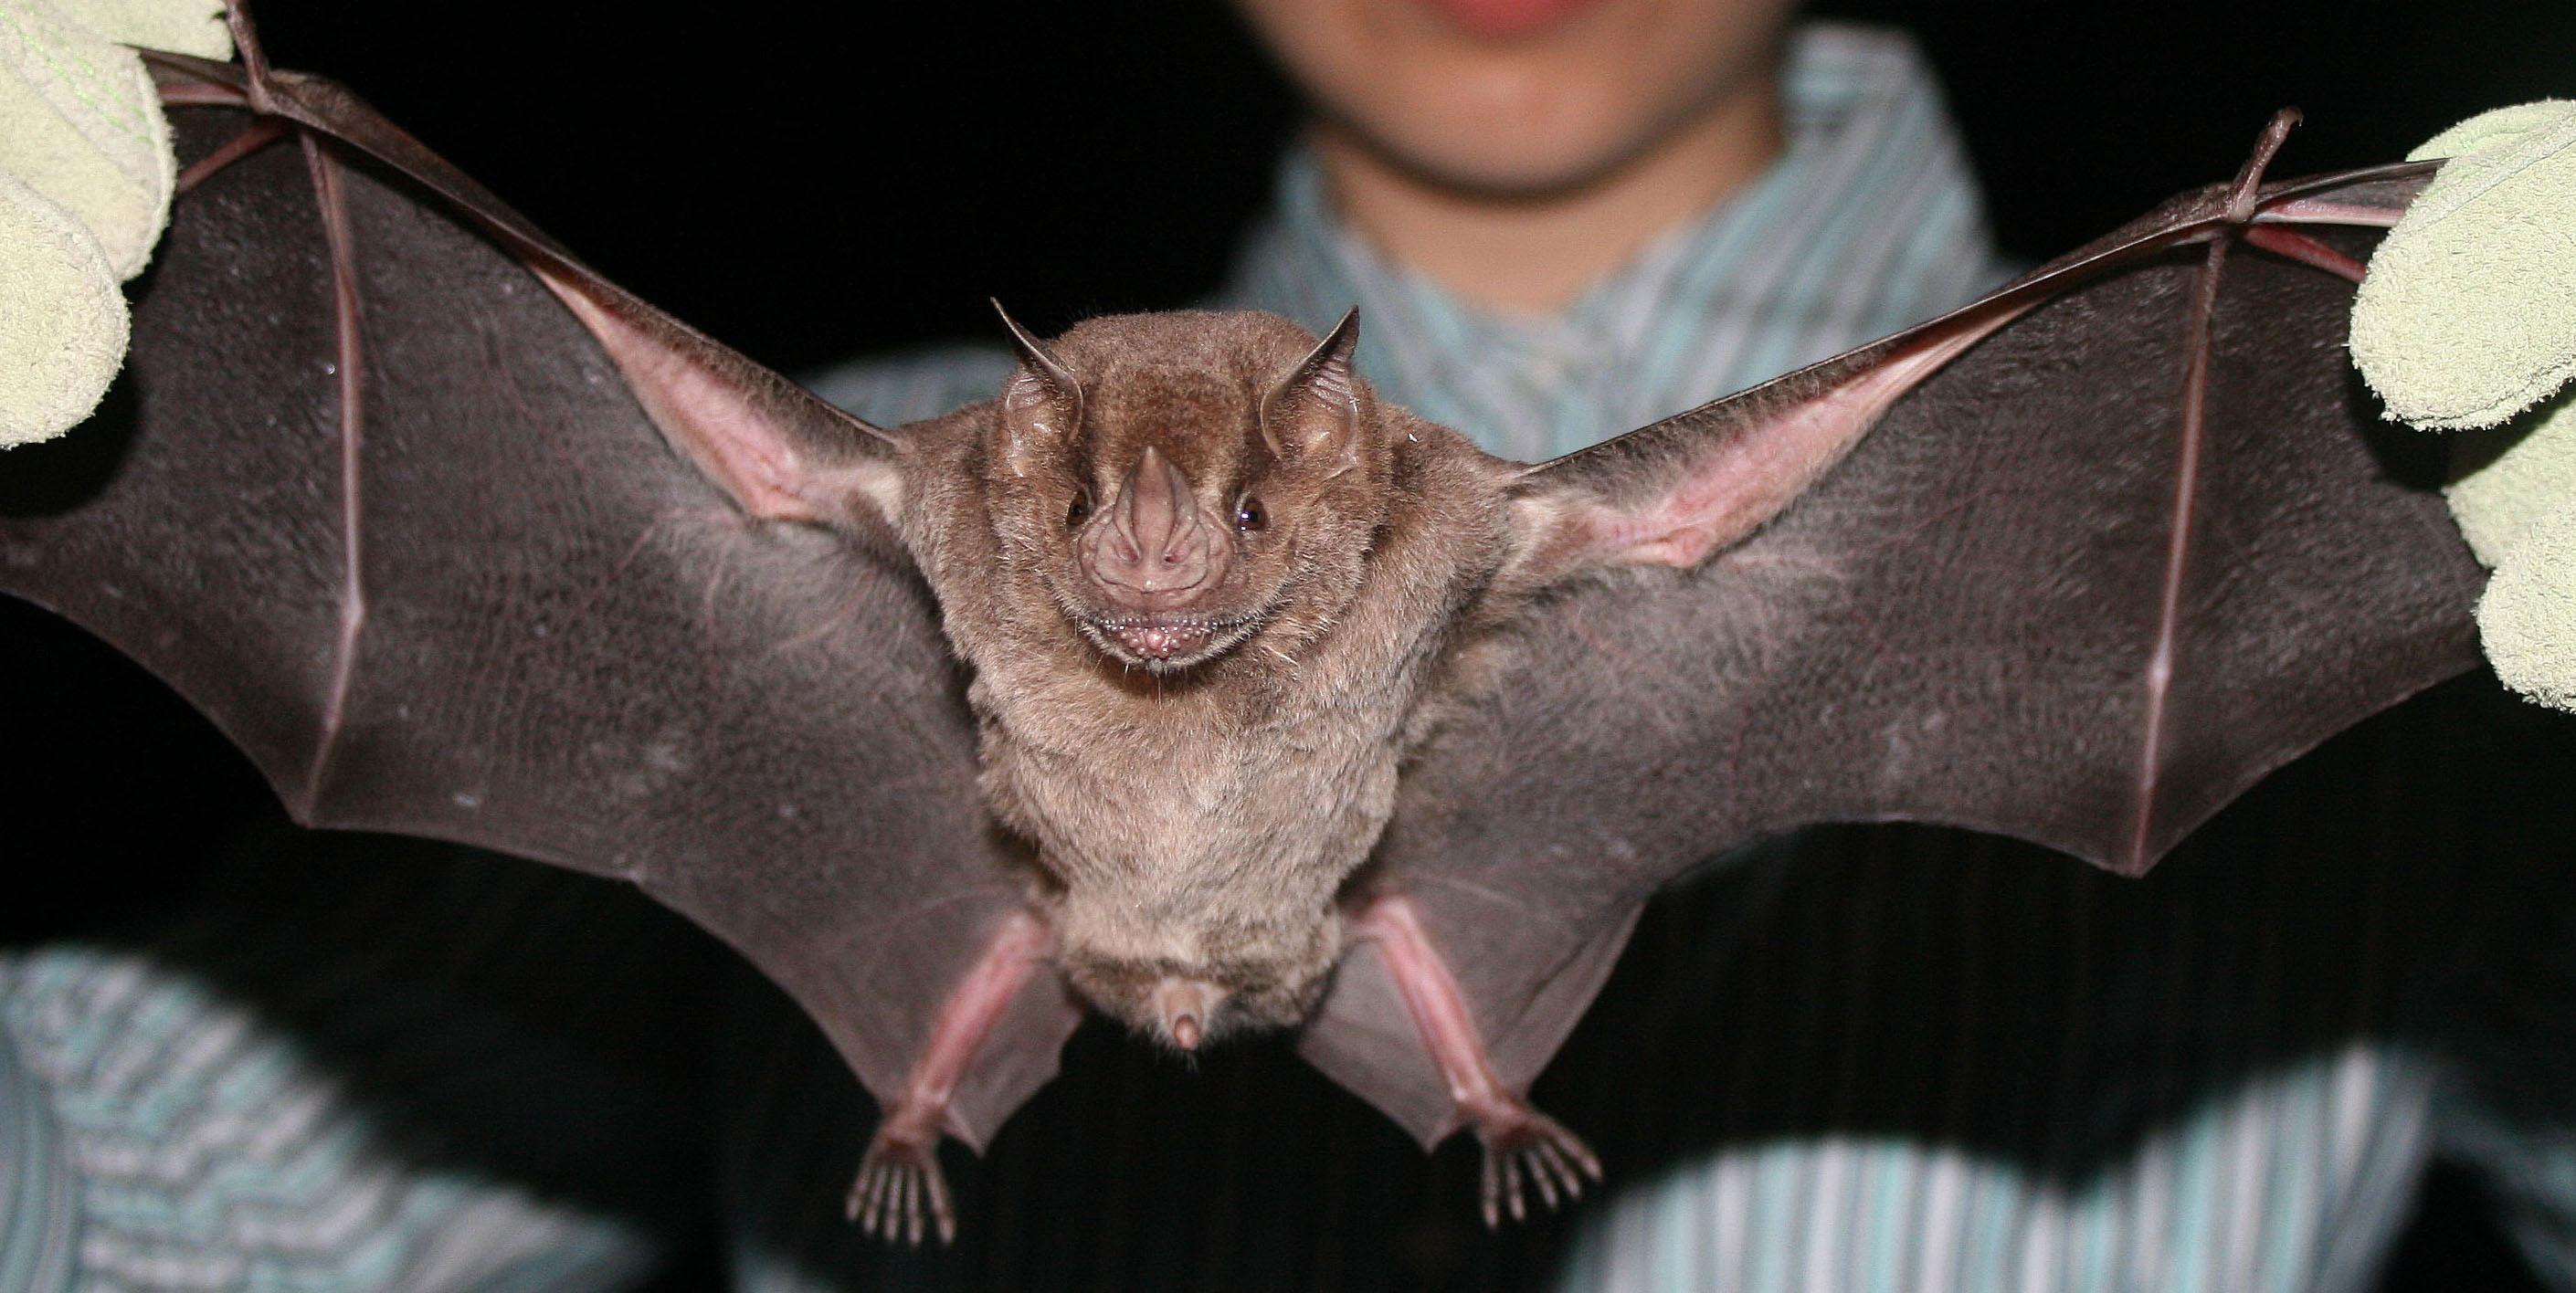 Female fruit bat